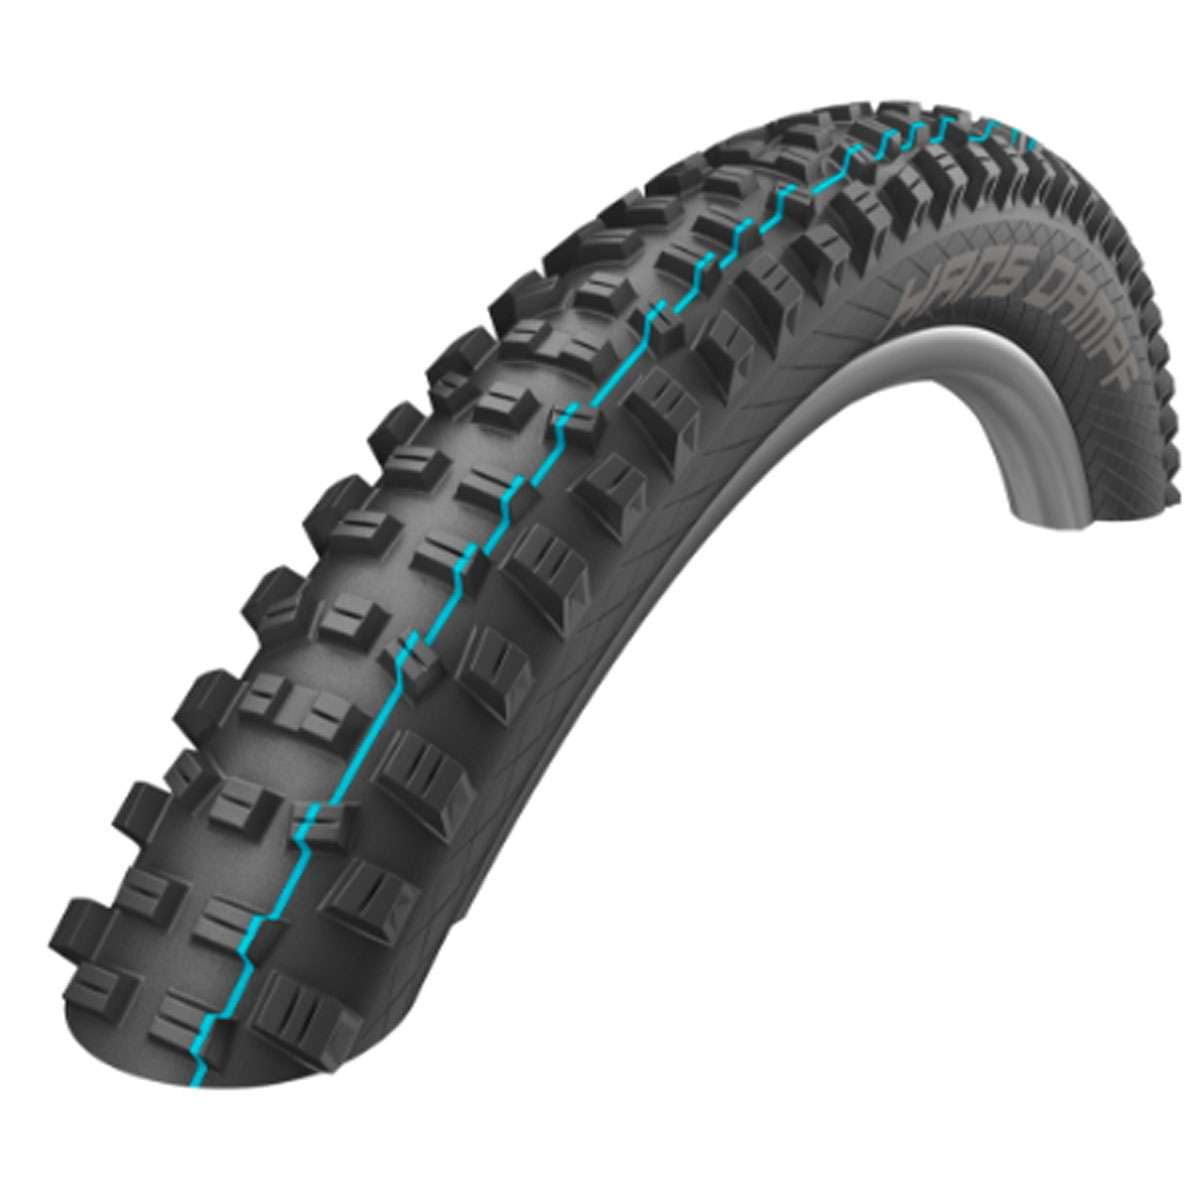 Schwalbe Hans Dampf HS 491 Performance TL Ready Addix Folding Mountain Bicycle Tire - 24 x 2.35 - 11601118